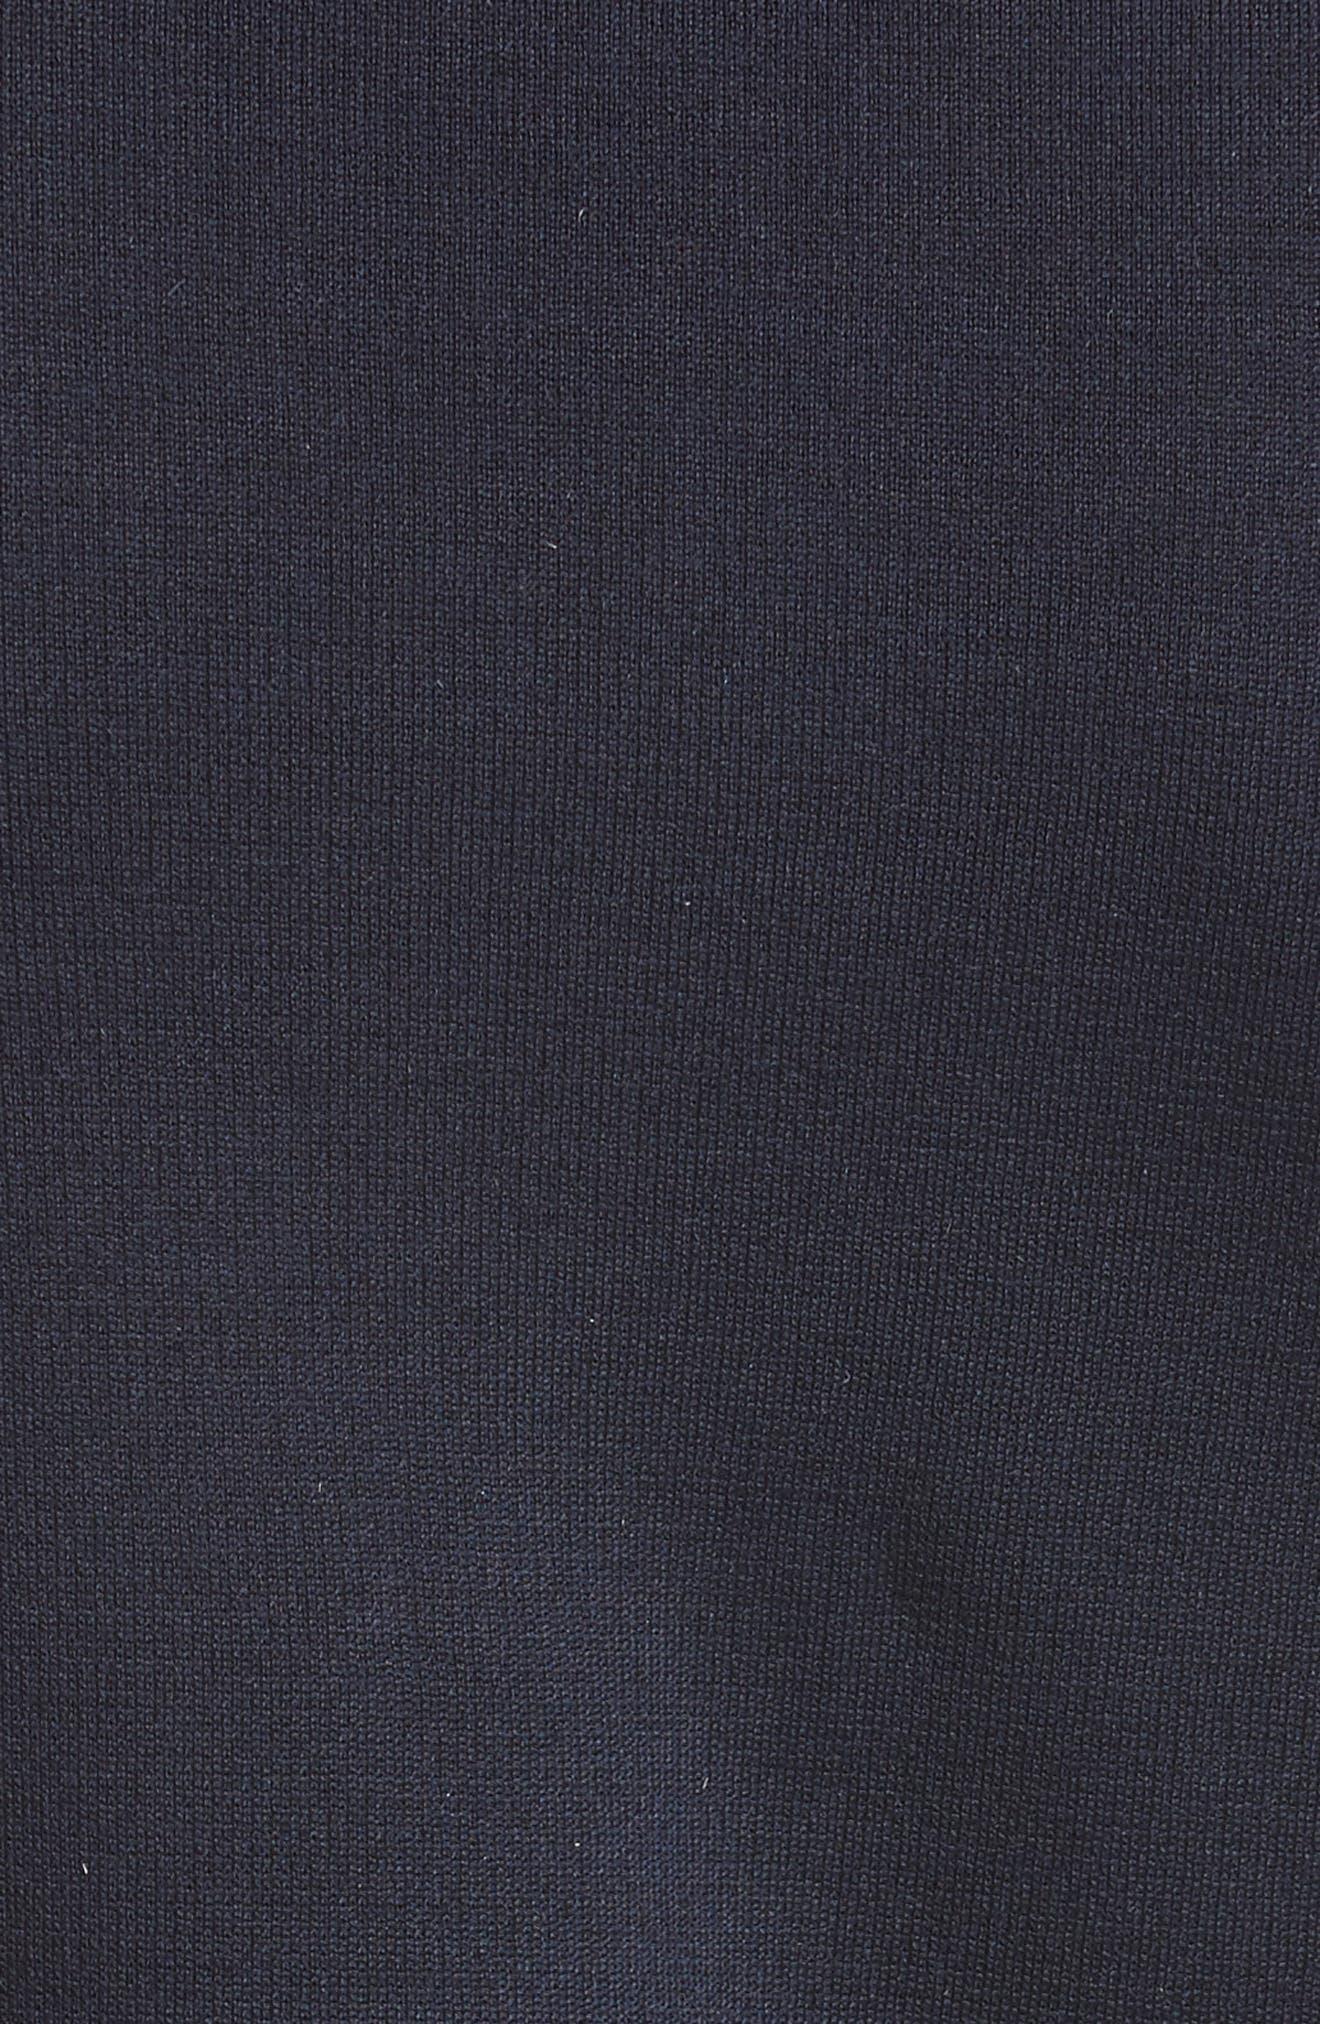 Milano Knit Contour Tank,                             Alternate thumbnail 5, color,                             NAVY